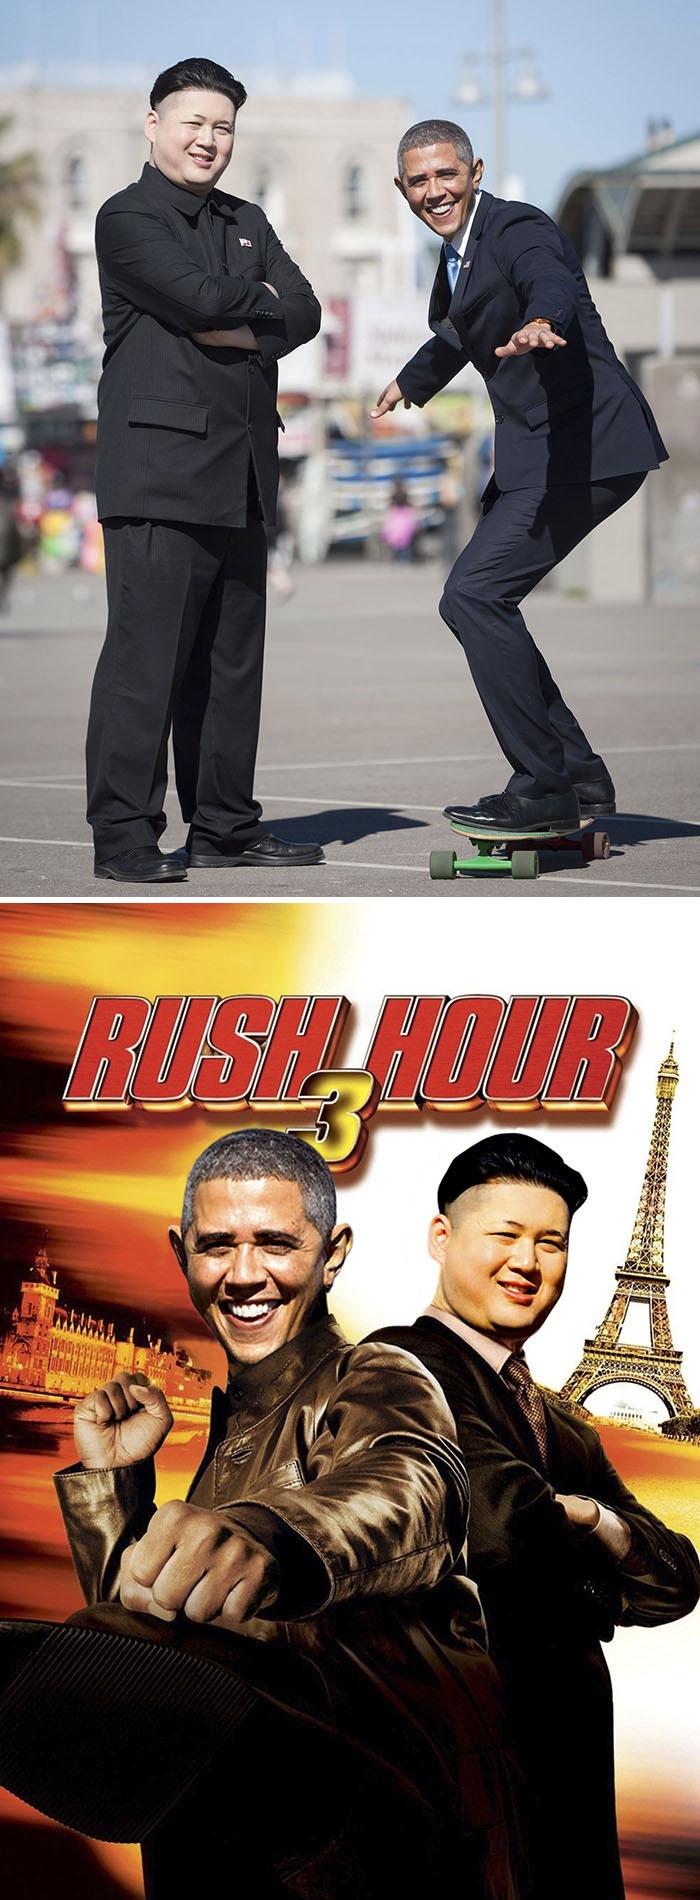 Barack Obama And Kim Jong Un Lookalikes